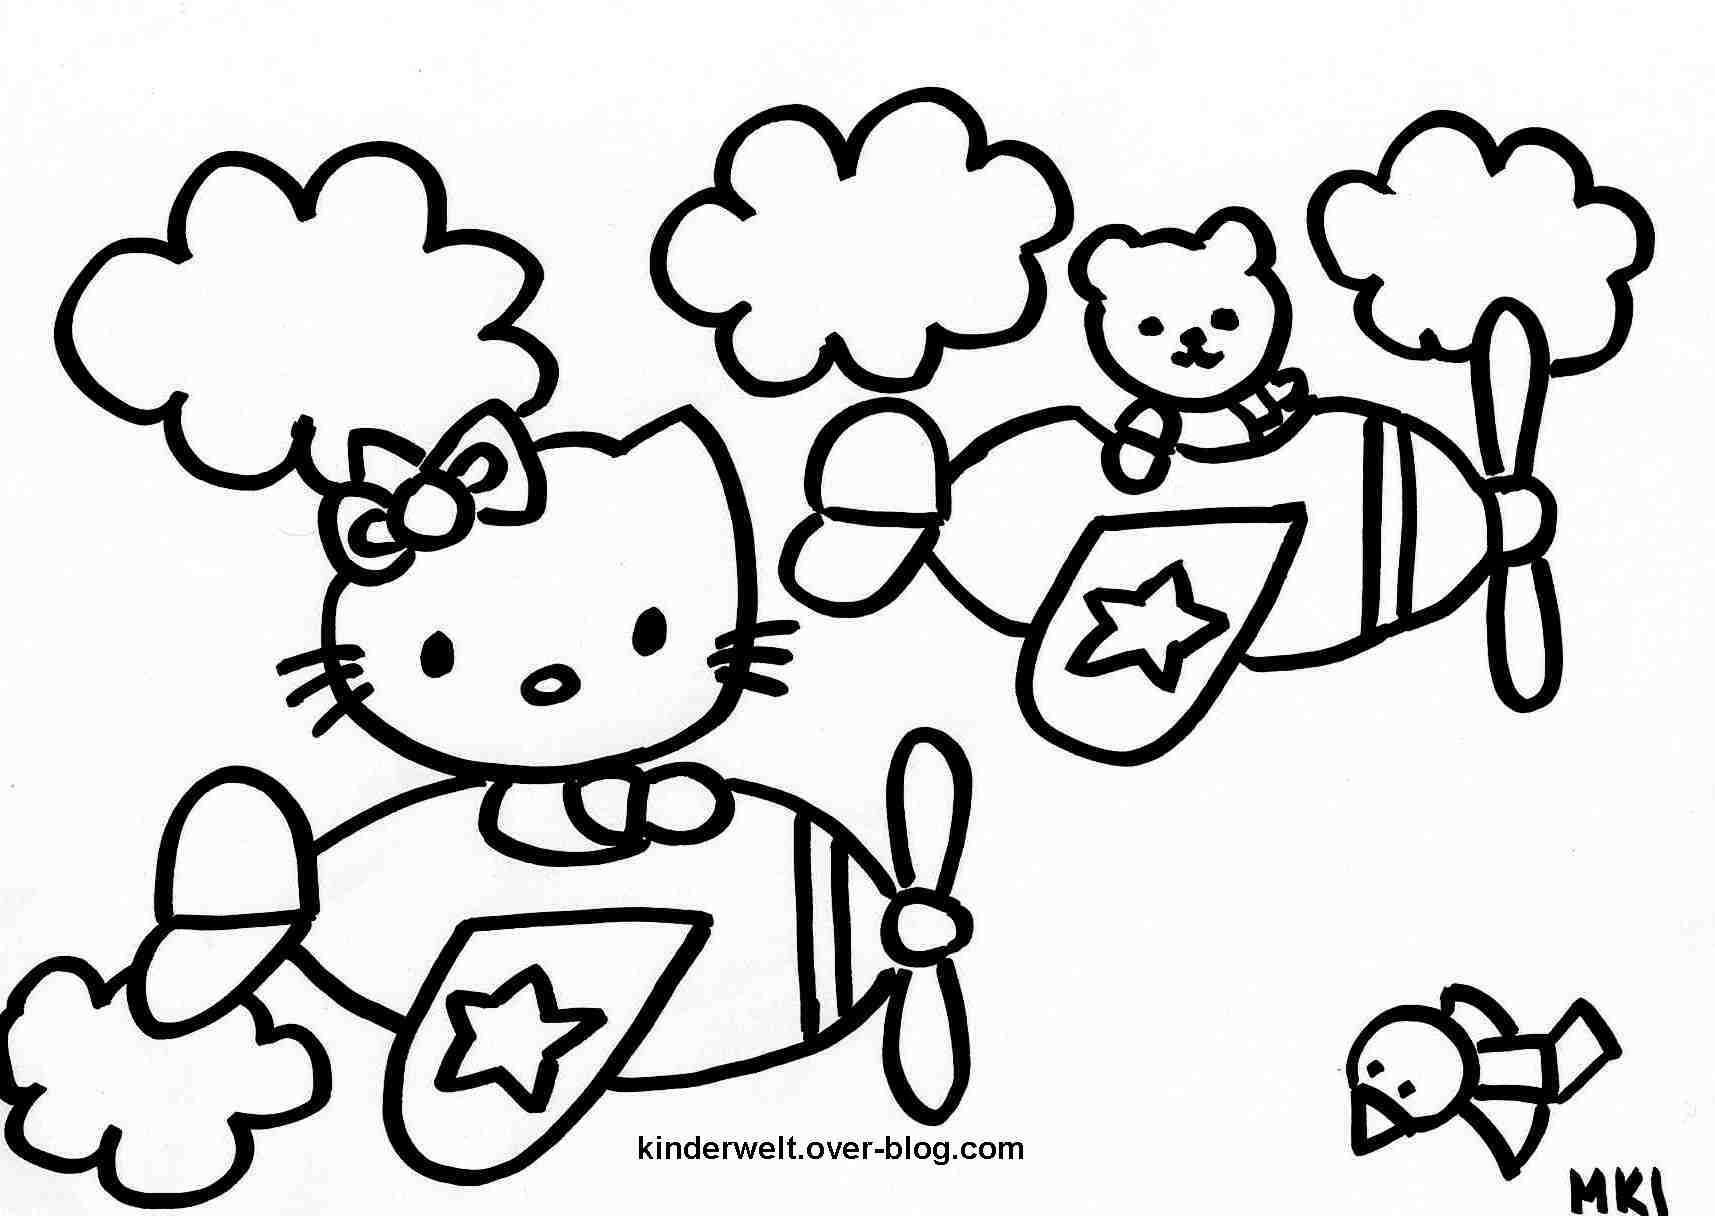 Malvorlagen Hello Kitty Neu Ausmalbilder Hello Kitty Kostenlos Schön Ausmalbilder Hello Kitty Bilder